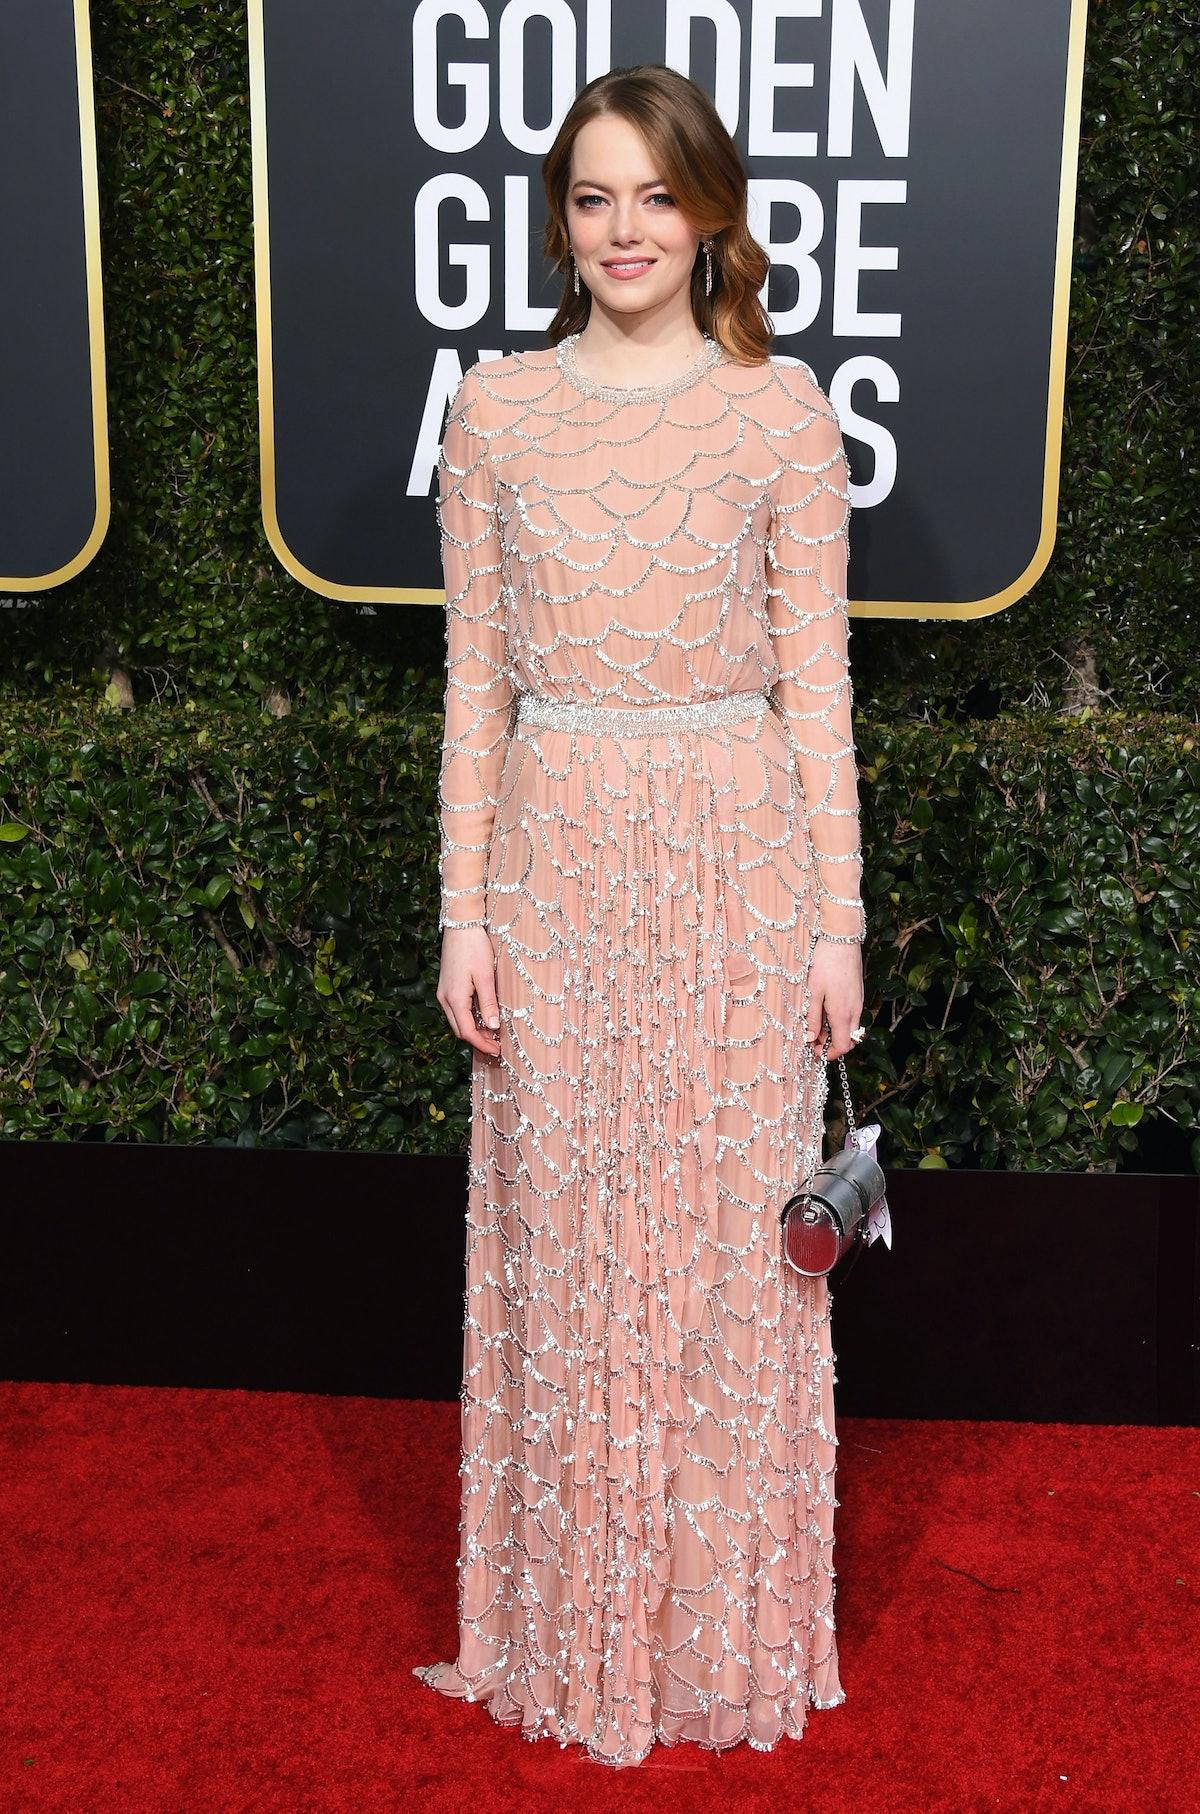 Emma Stone wearing pink Louis Vuitton Atelier gown